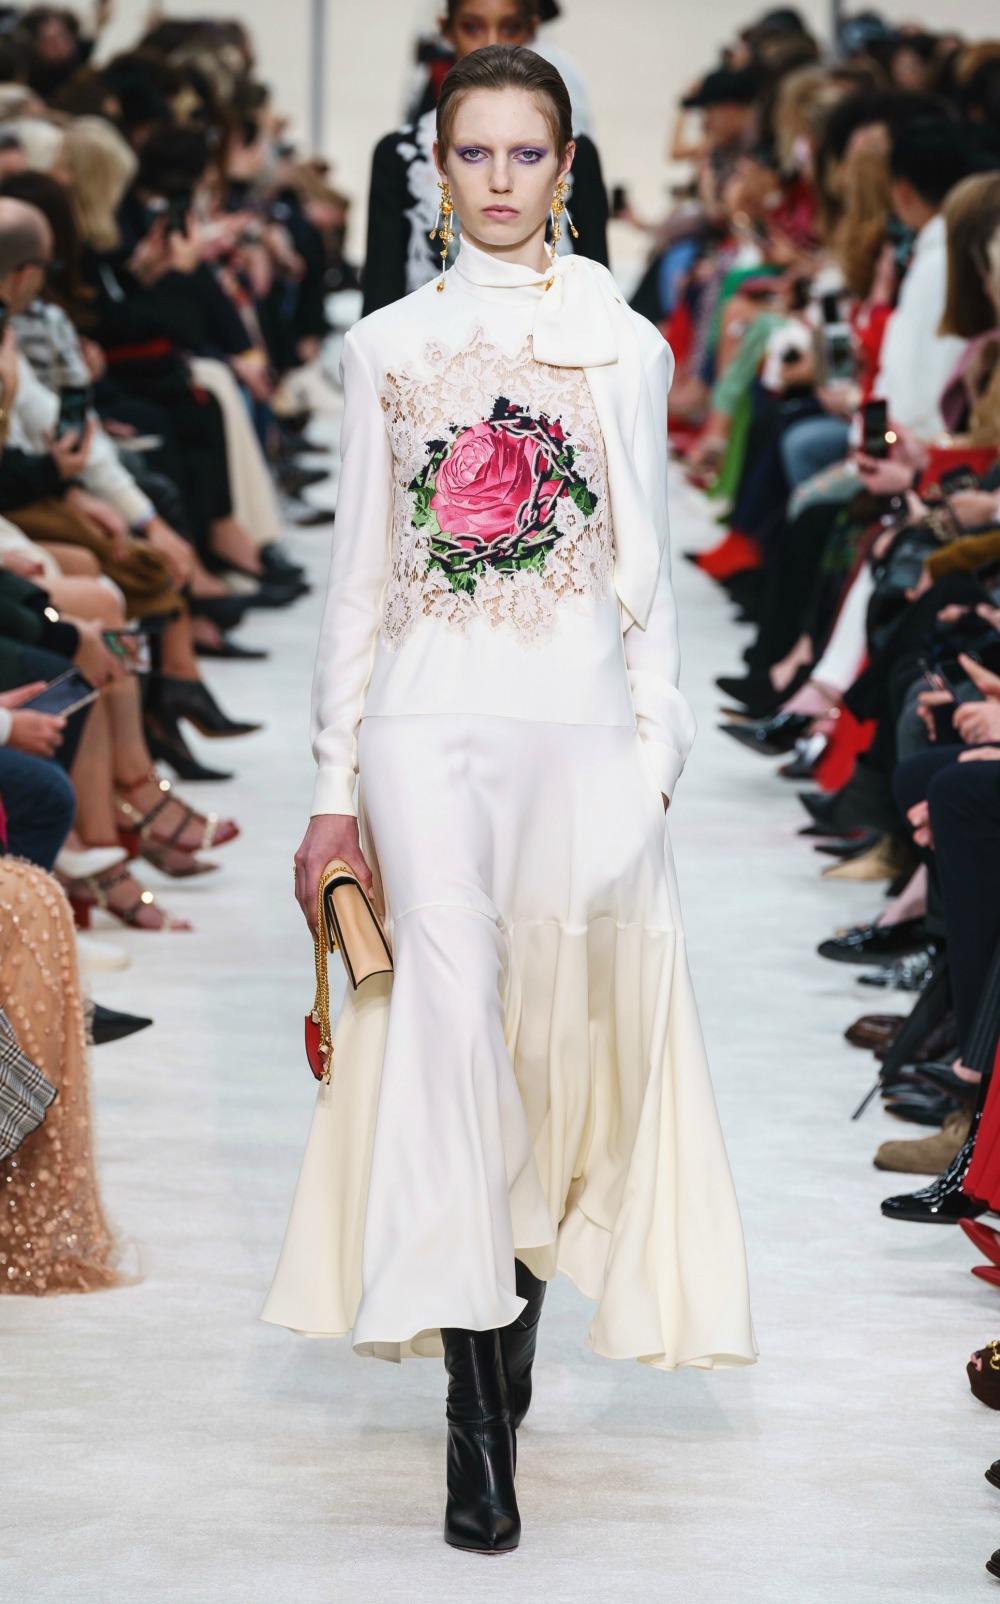 Best Paris Fashion Week Looks -Valentino Fall 2019 Runway Collection #PFW #FashionWeek